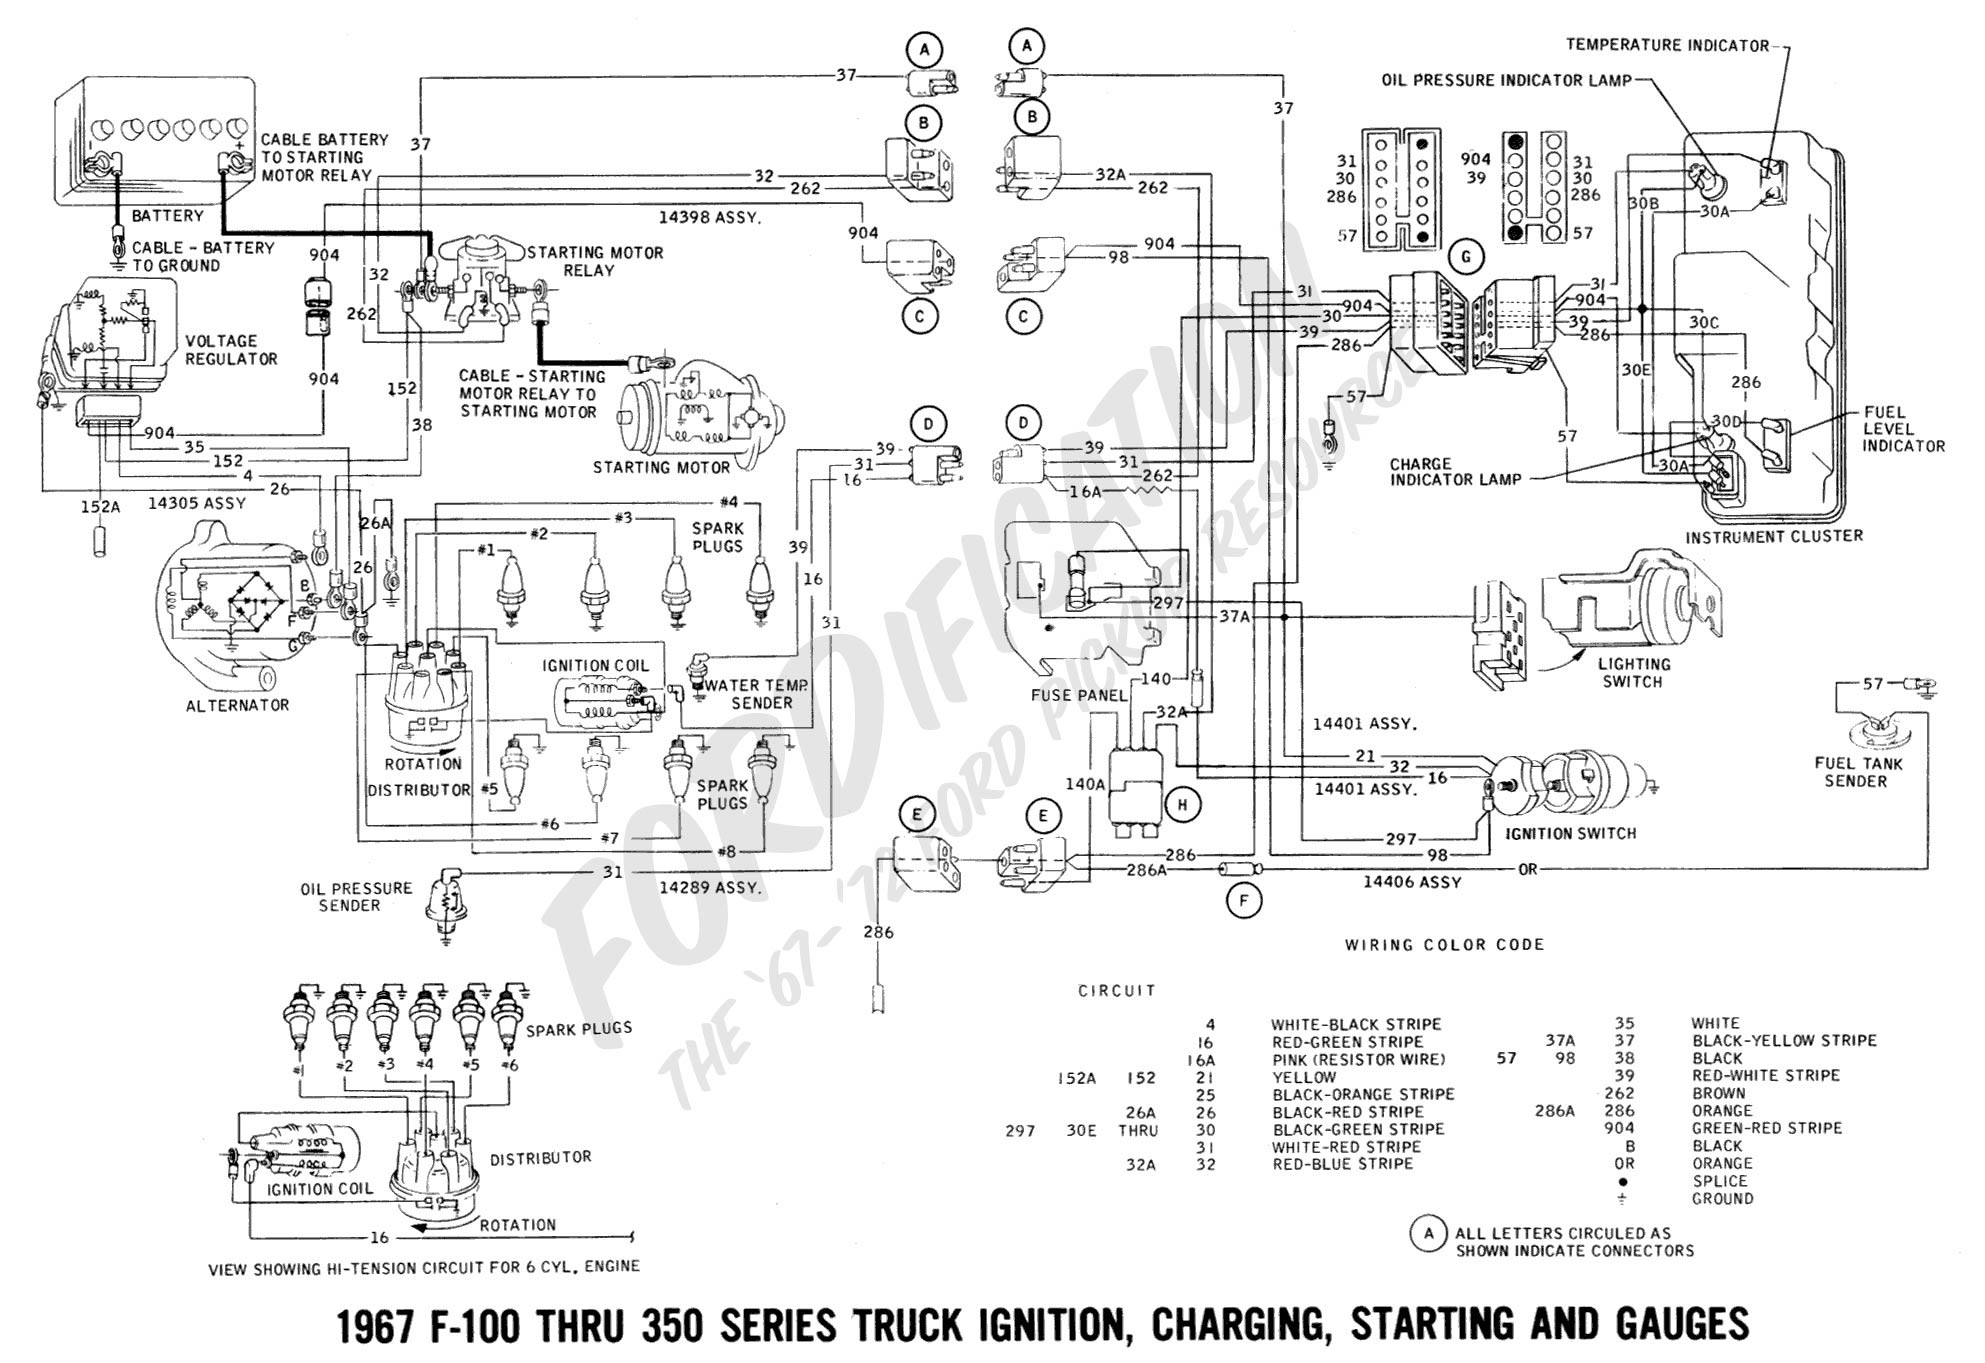 ls3 throttle wiring diagram schematic diagrams rh ogmconsulting co LS3  Engine Wiring Diagram LS1 Starter Wiring